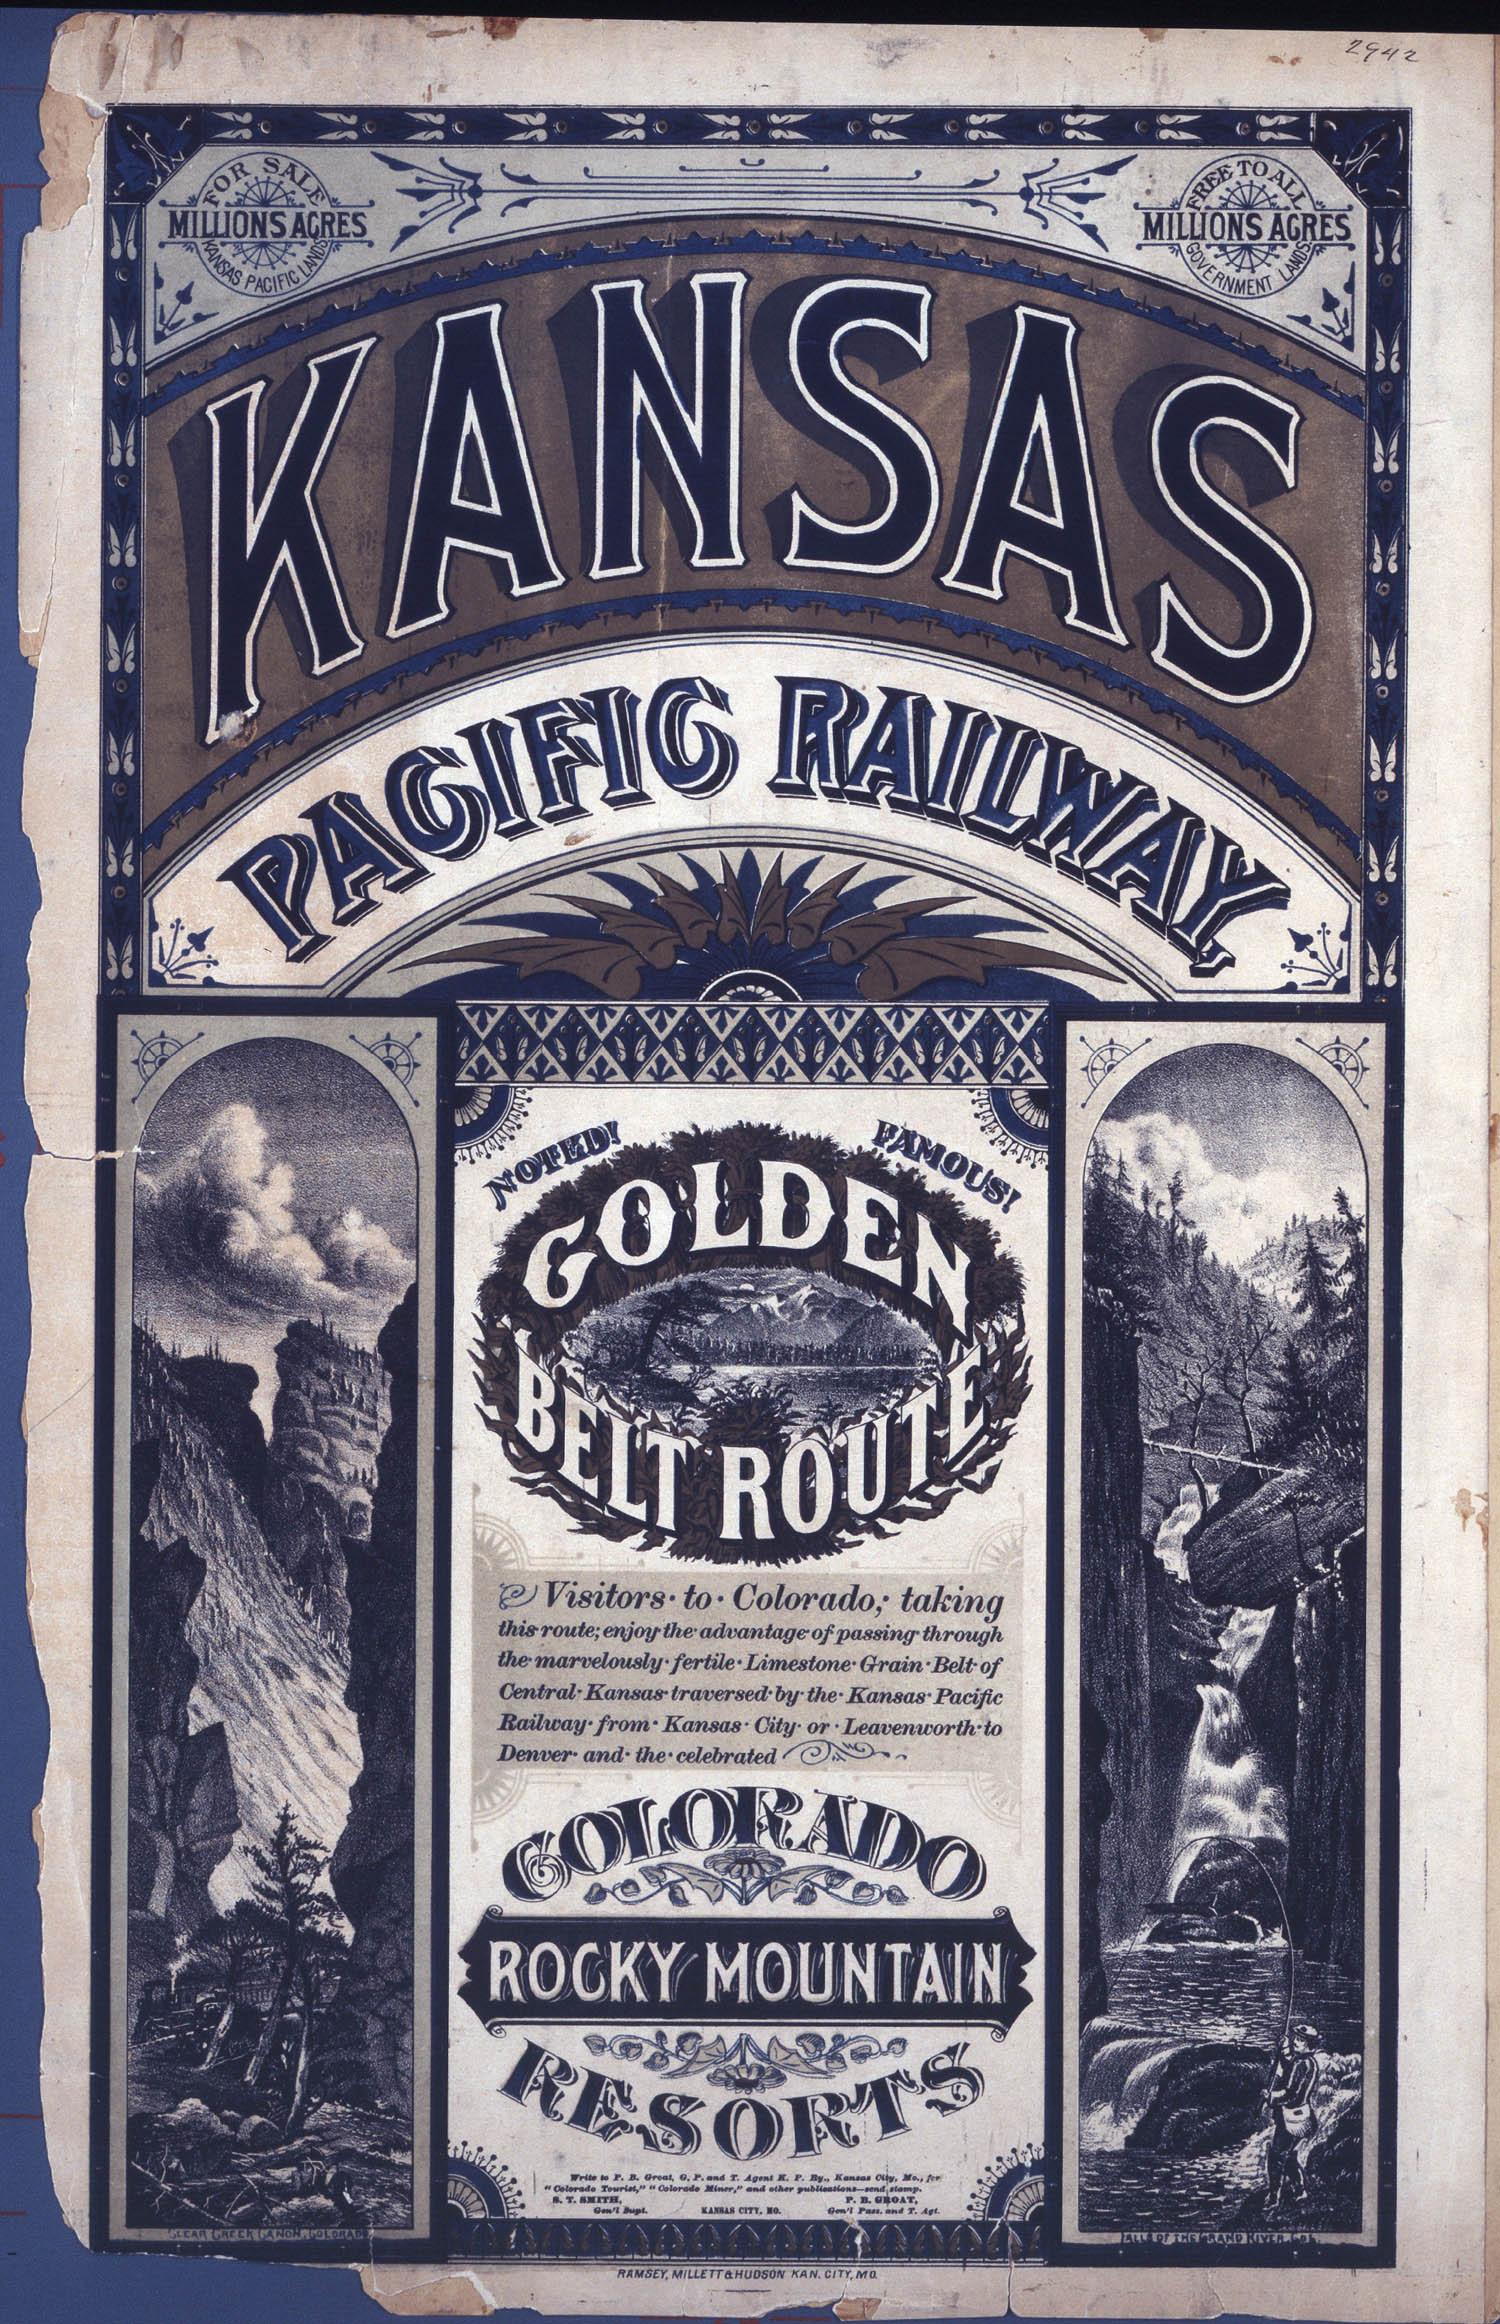 Kansas Pacific Railway golden belt route